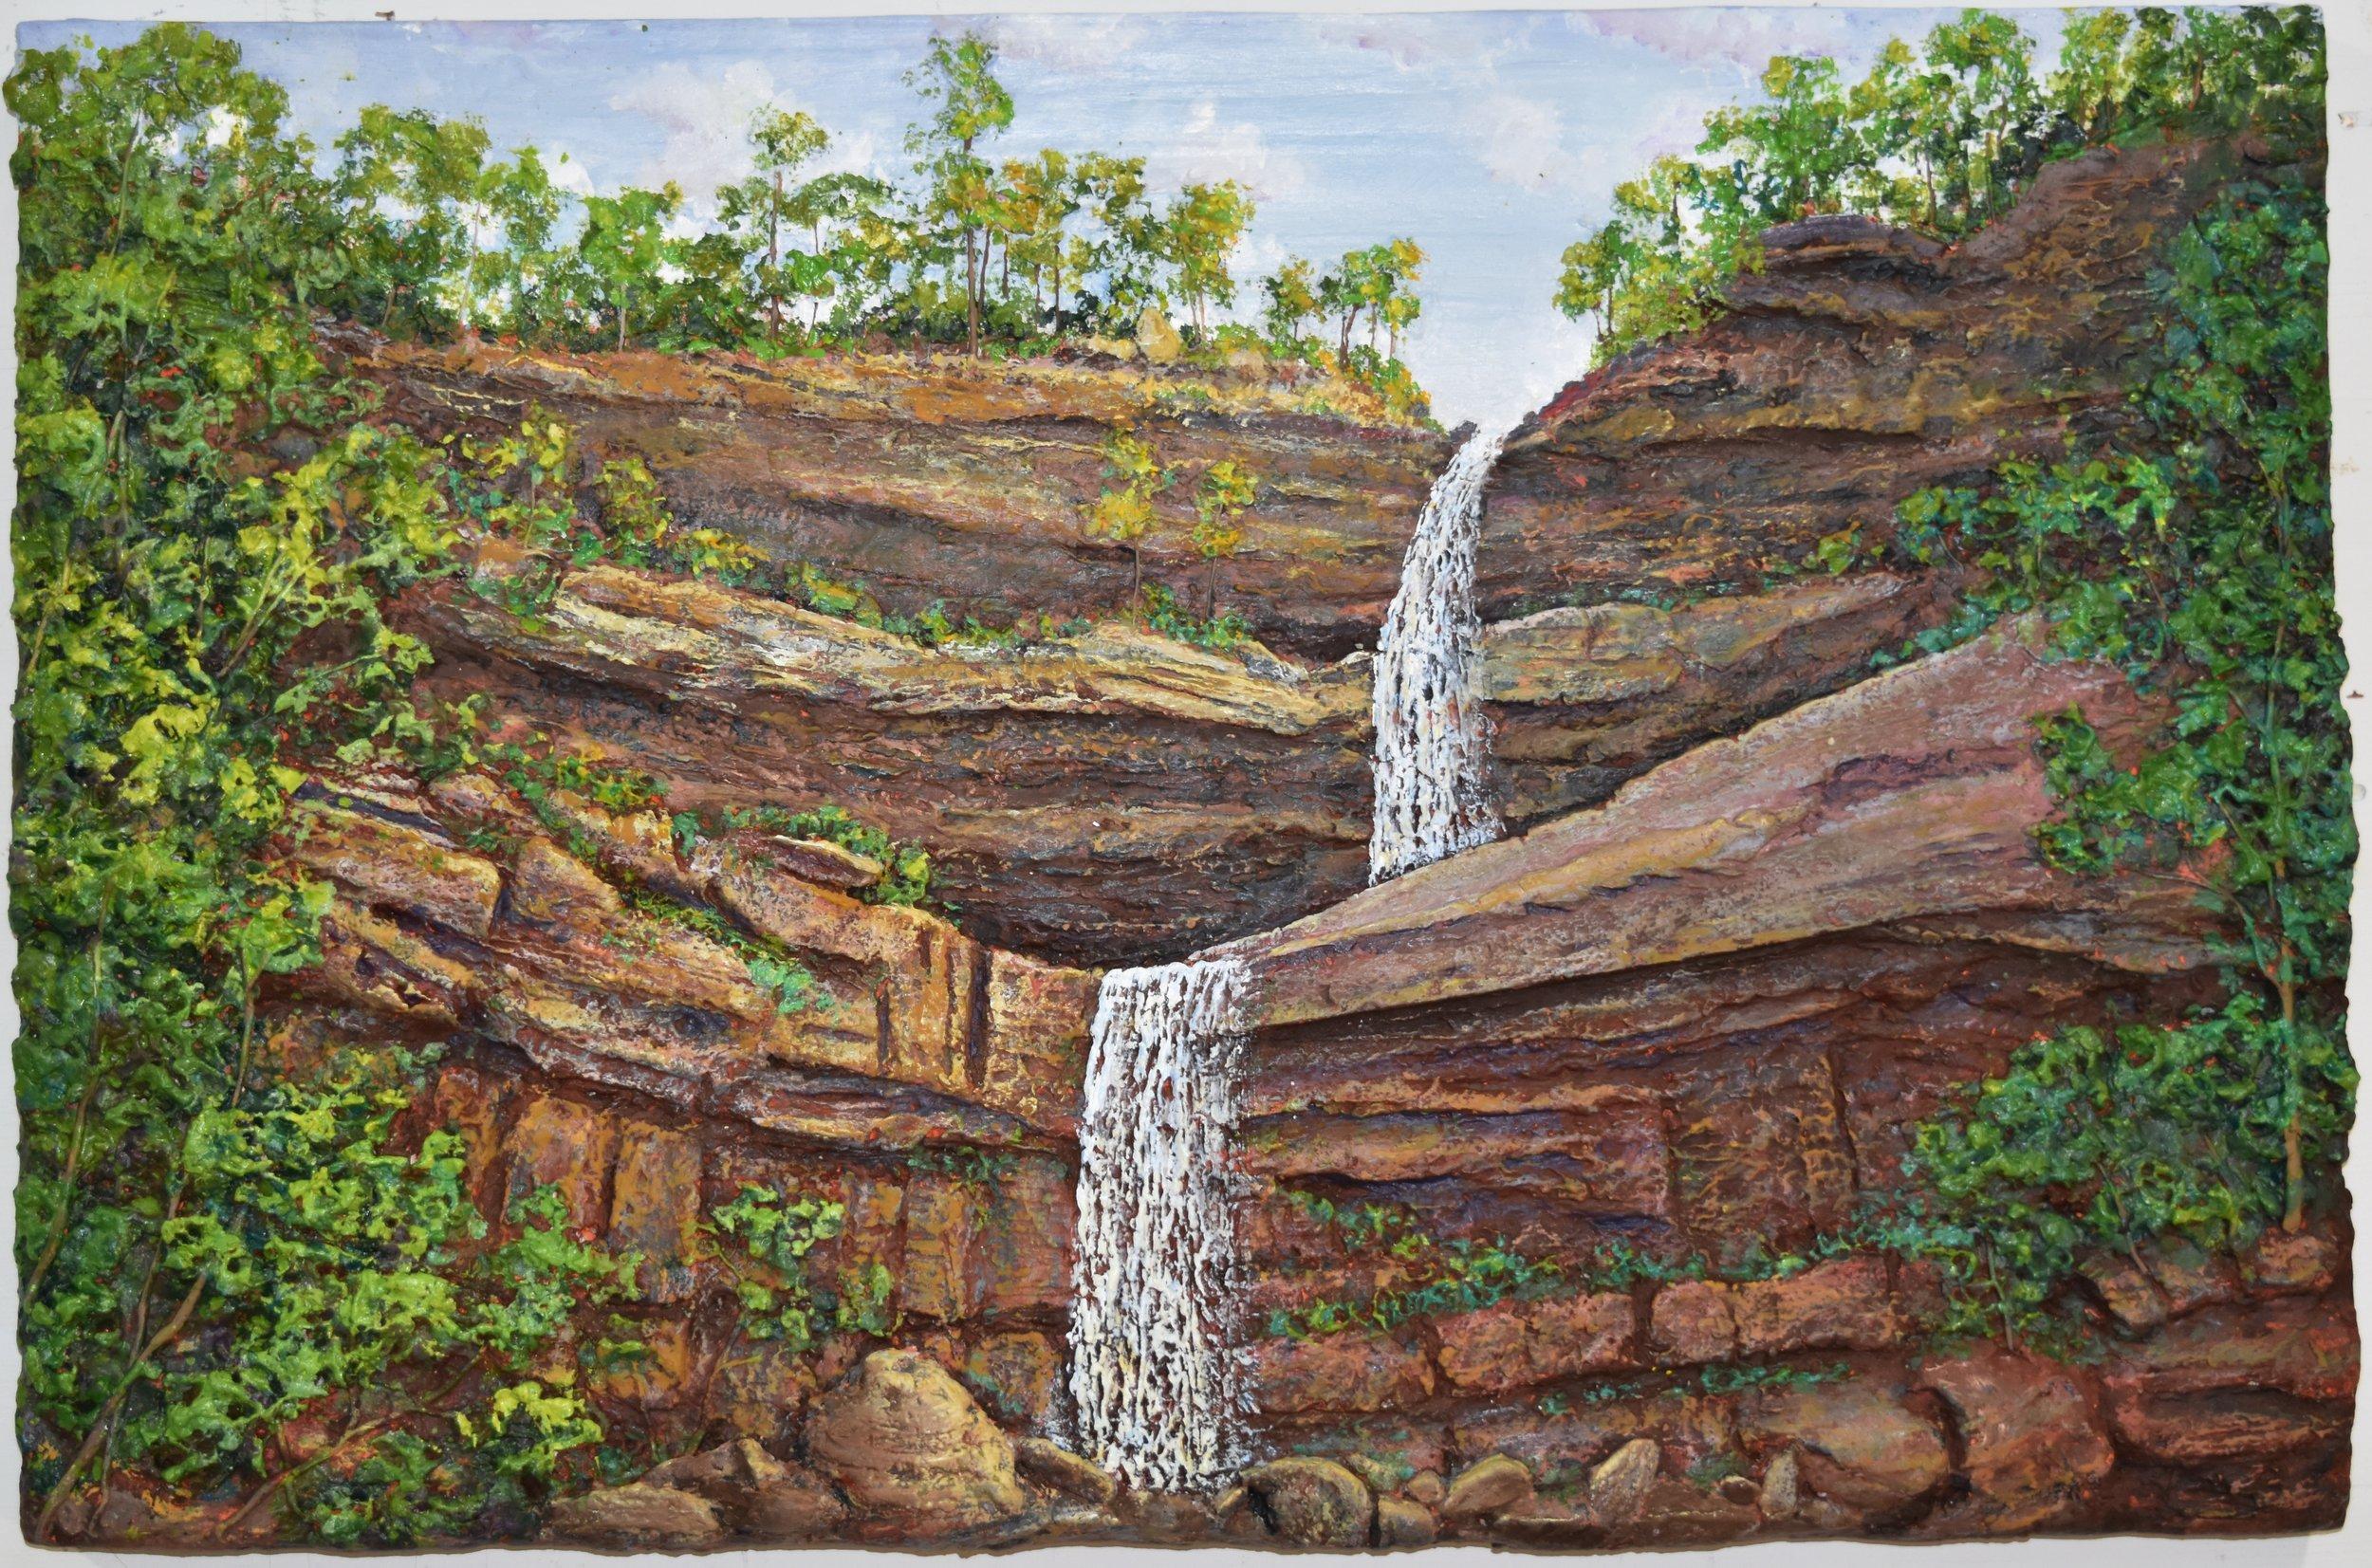 Kaaterskil Falls, NY